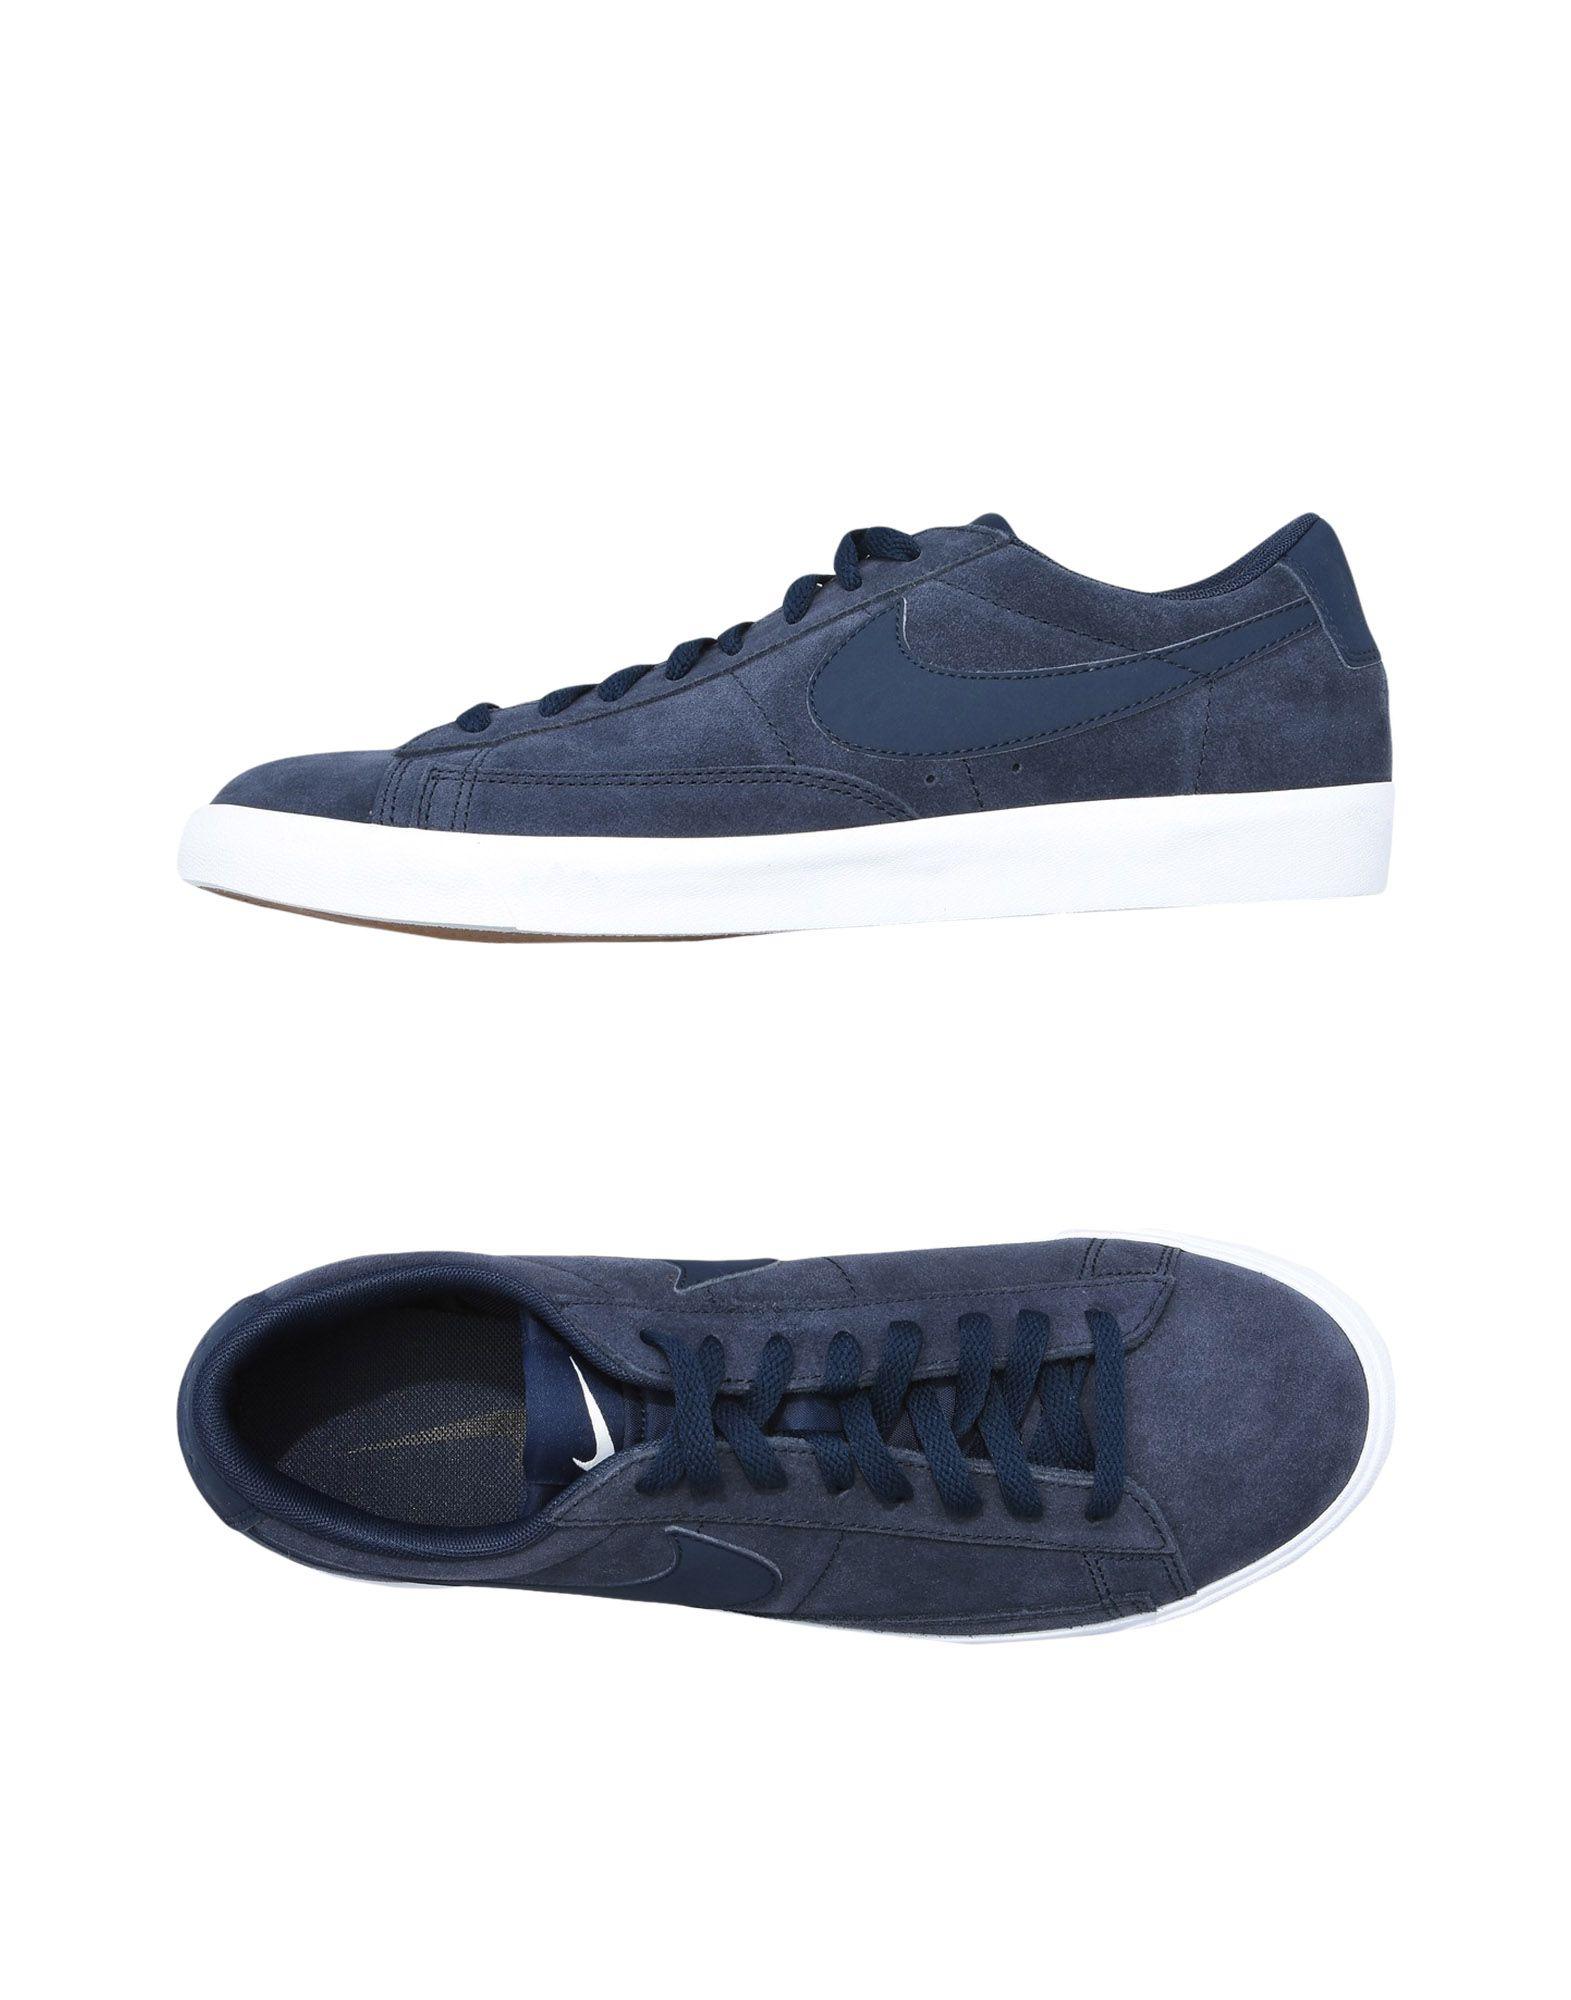 Sneakers Nike Blazer Low Suede - Uomo - 11498464CN